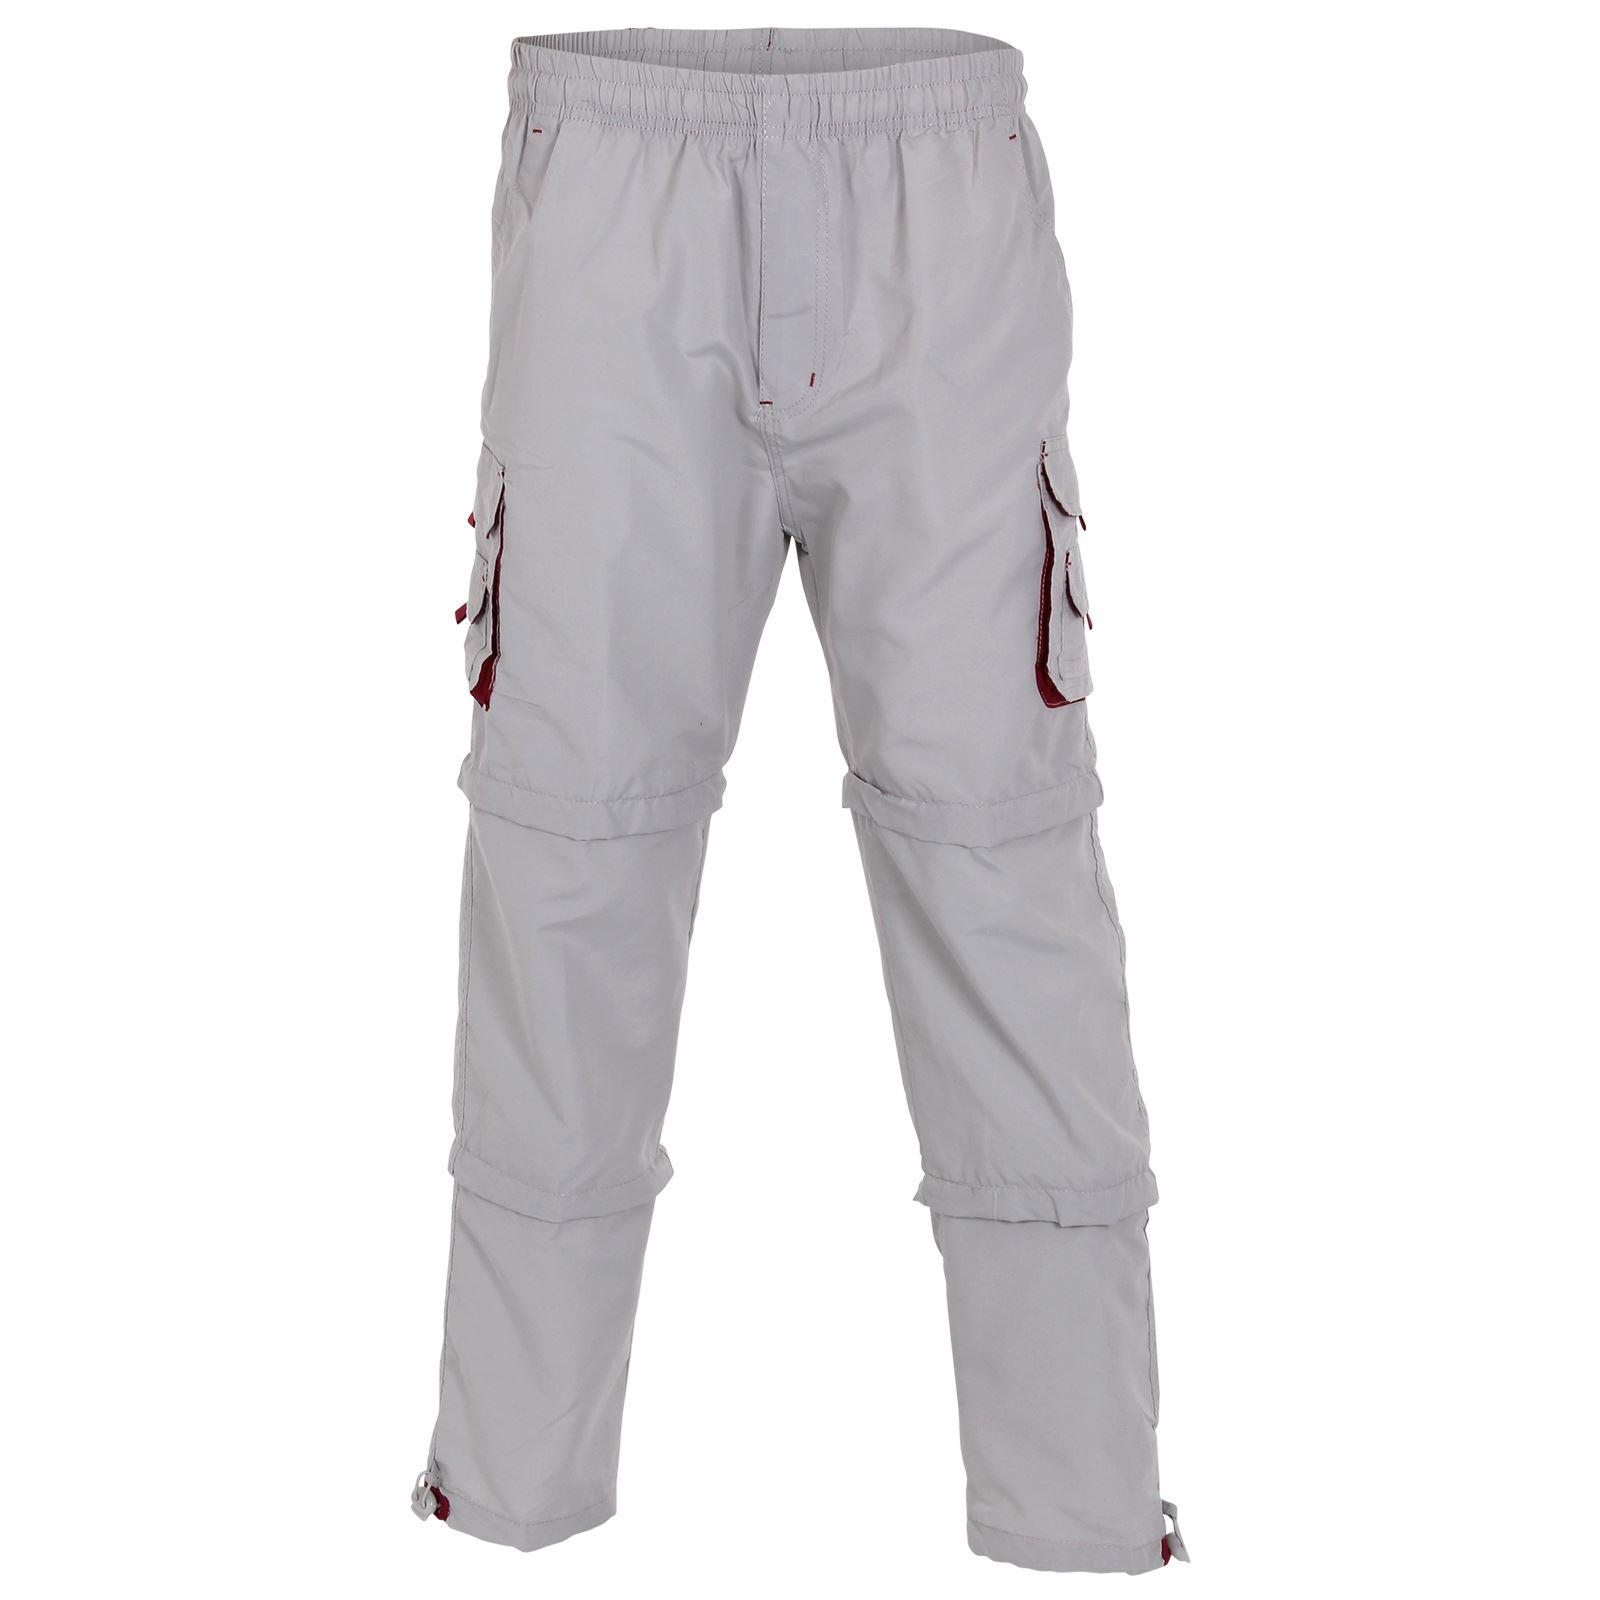 pantalon homme cargo militaire 3 en 1 zip transformable bermuda 3 4 short ebay. Black Bedroom Furniture Sets. Home Design Ideas